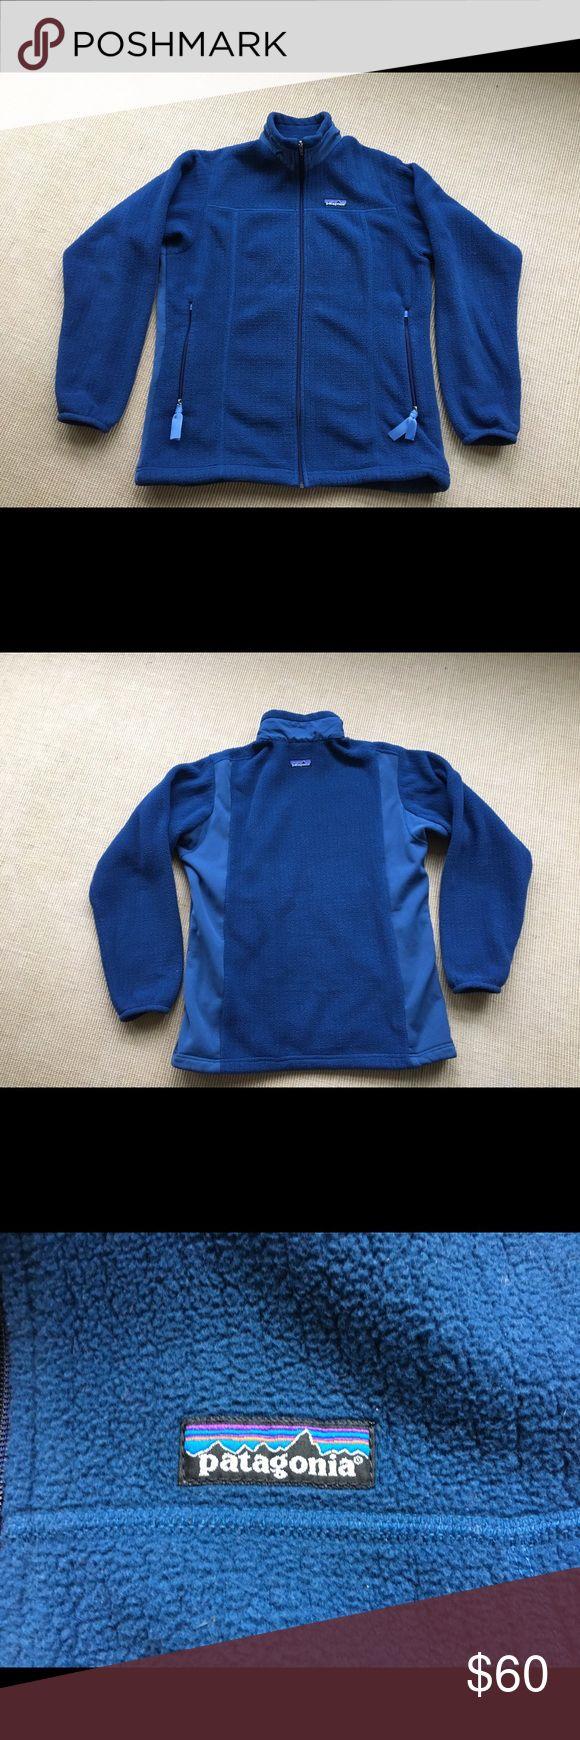 Patagonia Regulator Fleece Jacket Medium Patagonia Fleece Regulator jacket. Full zip. Nice,soft material. Blue in color. Logo on front and back. Women's Medium. Patagonia Jackets & Coats Utility Jackets